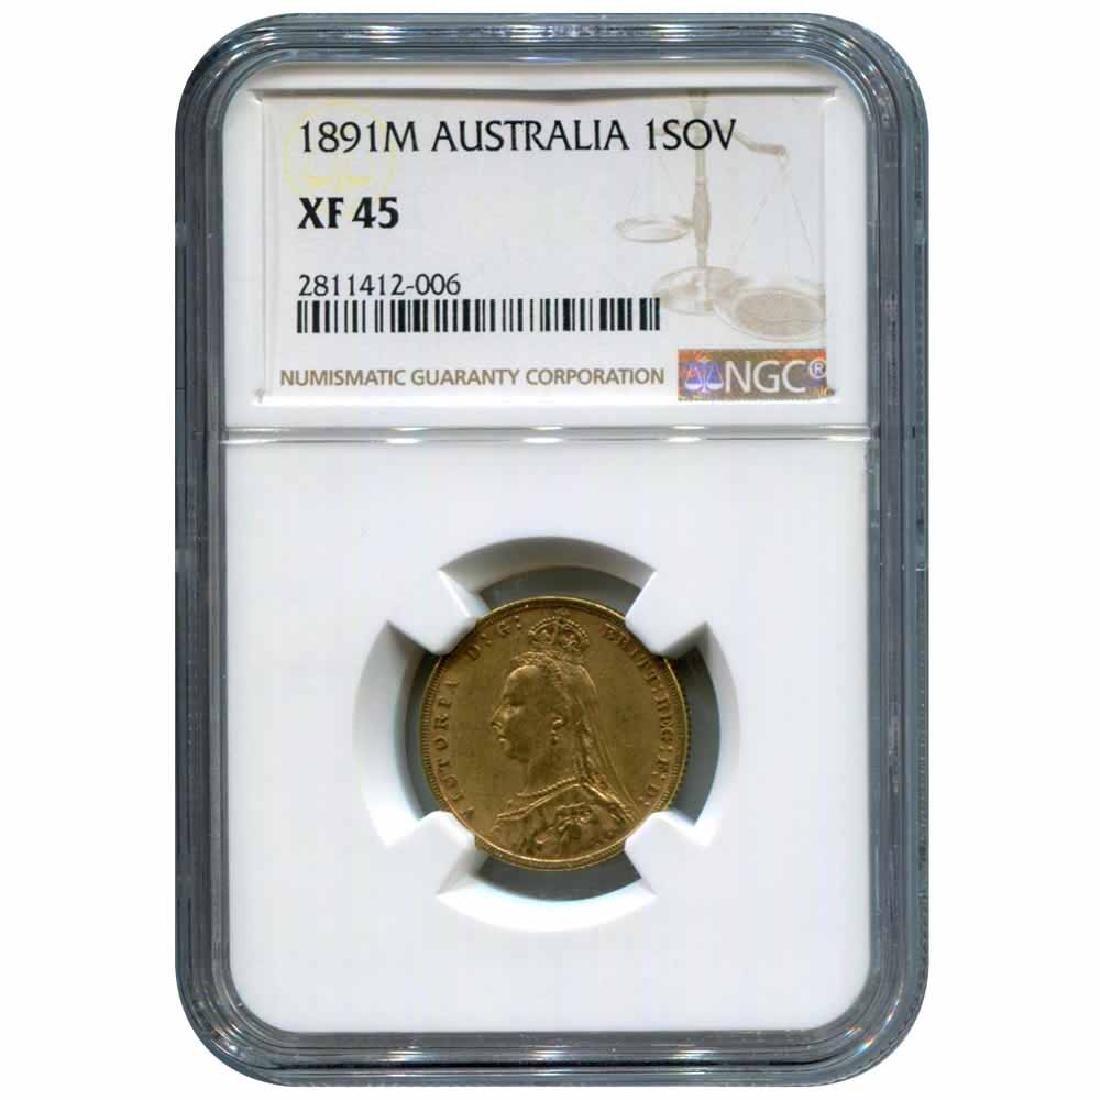 Australia gold sovereign 1891M XF45 NGC